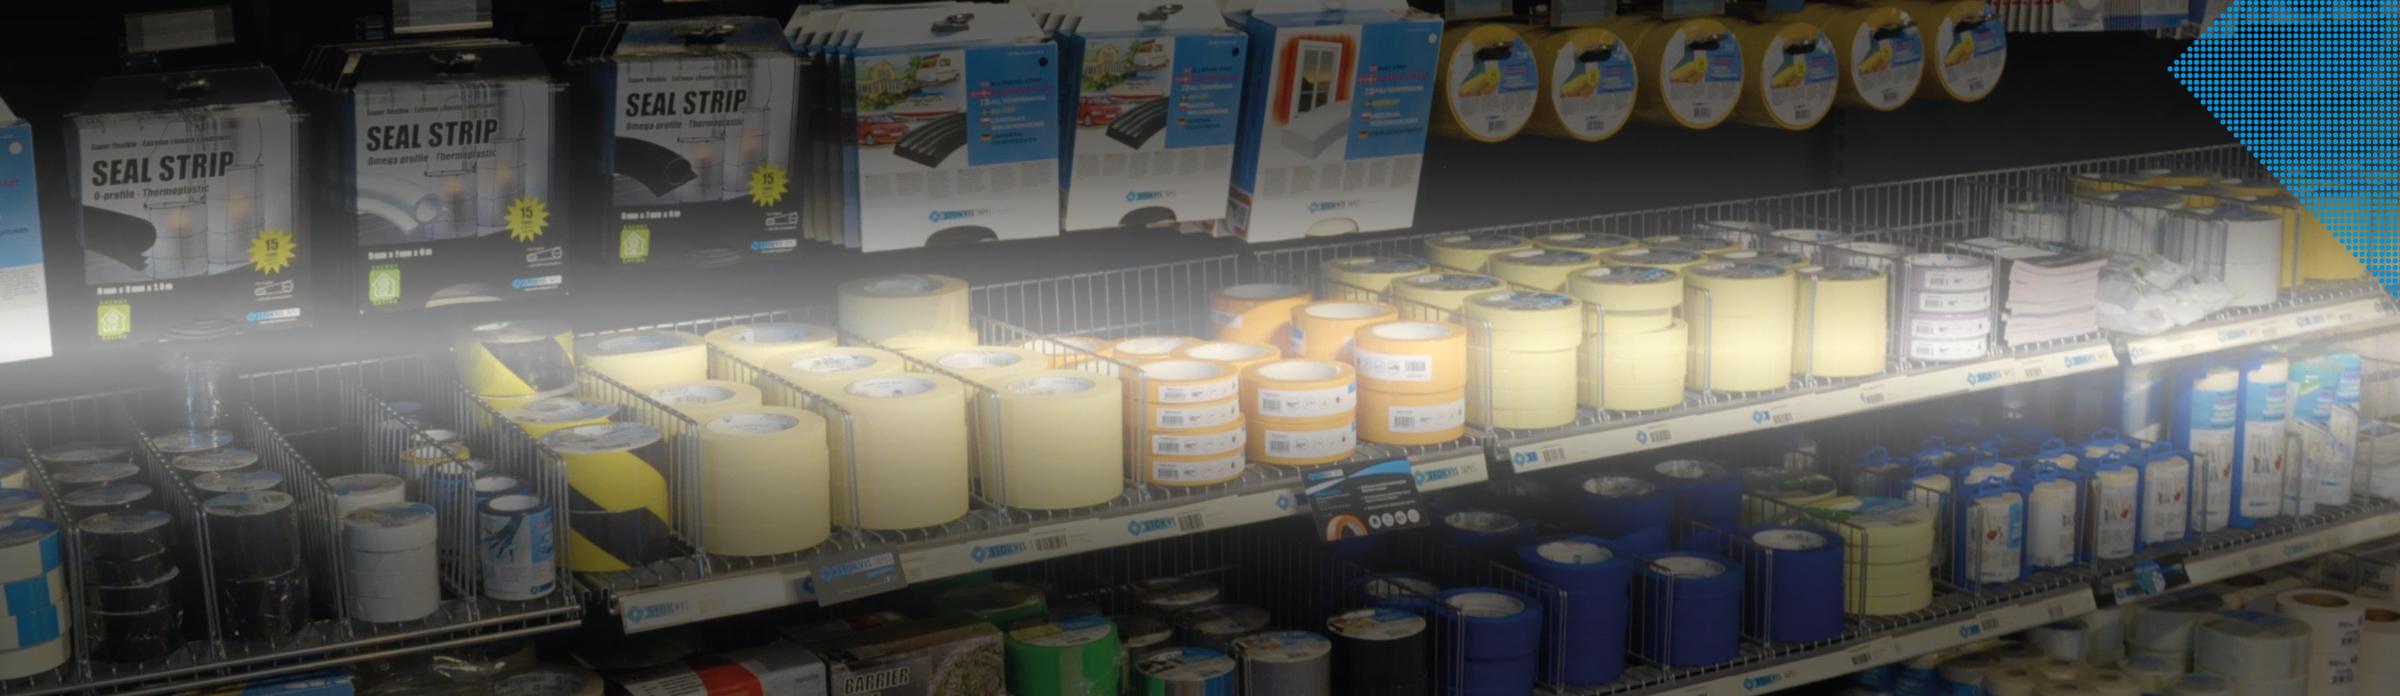 Home - Wholesale